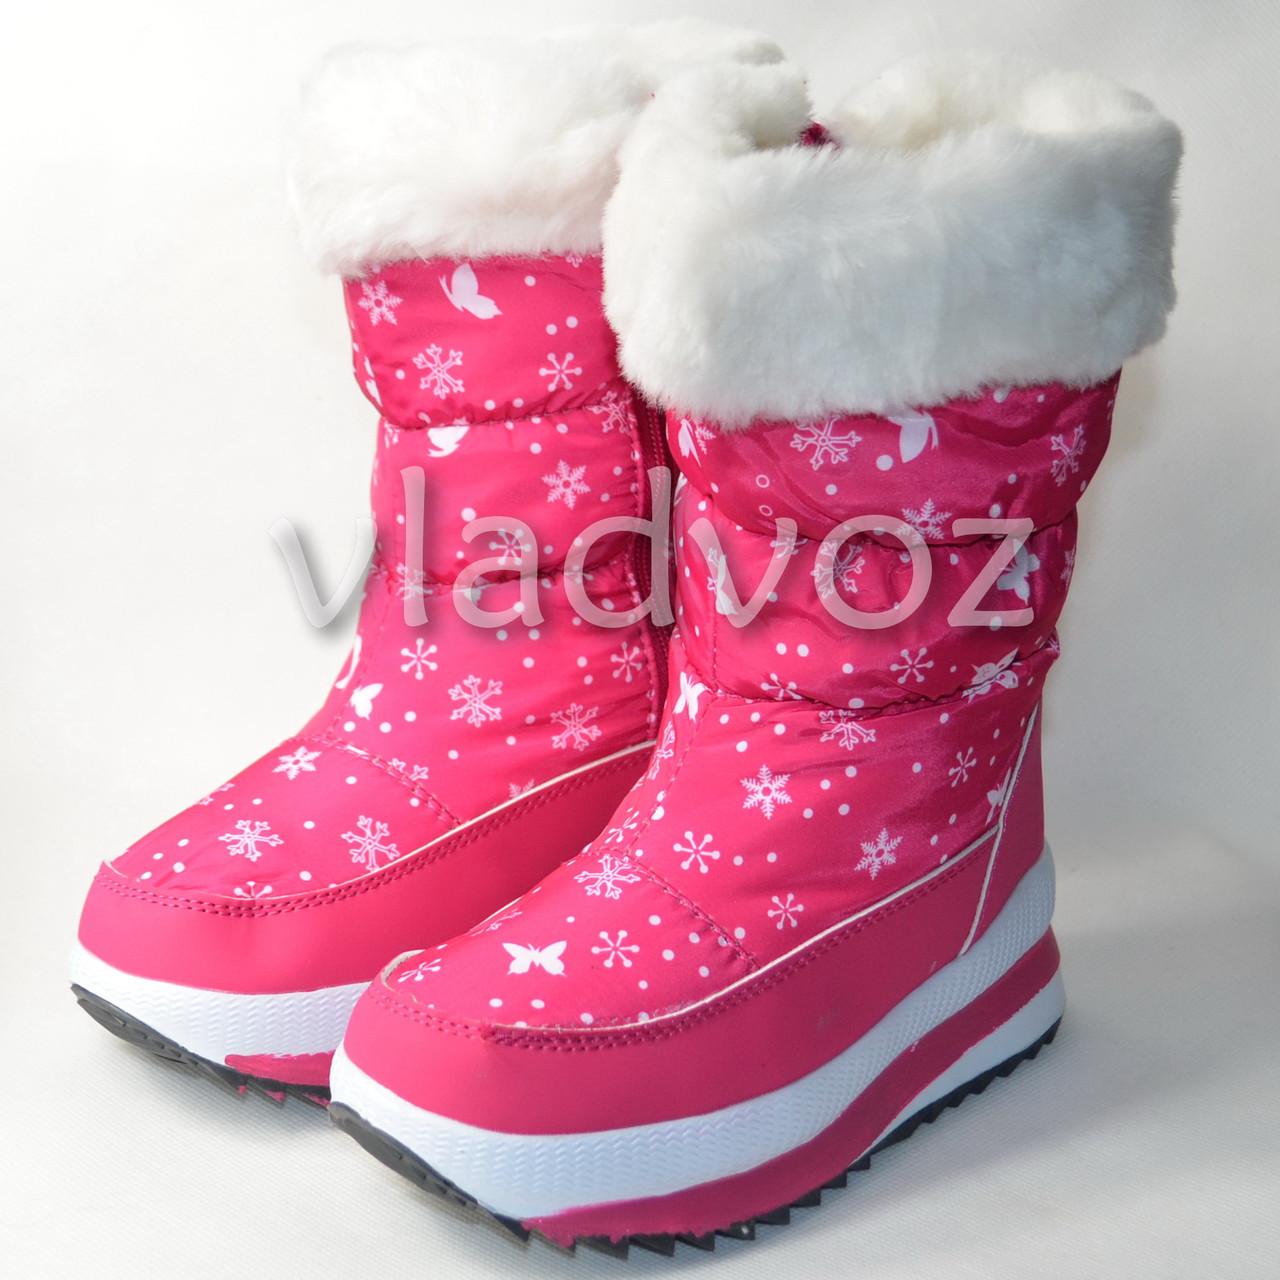 ad0b93ab3 Детские зимние дутики на зиму для девочки сапоги снежинки малиновые 33р.